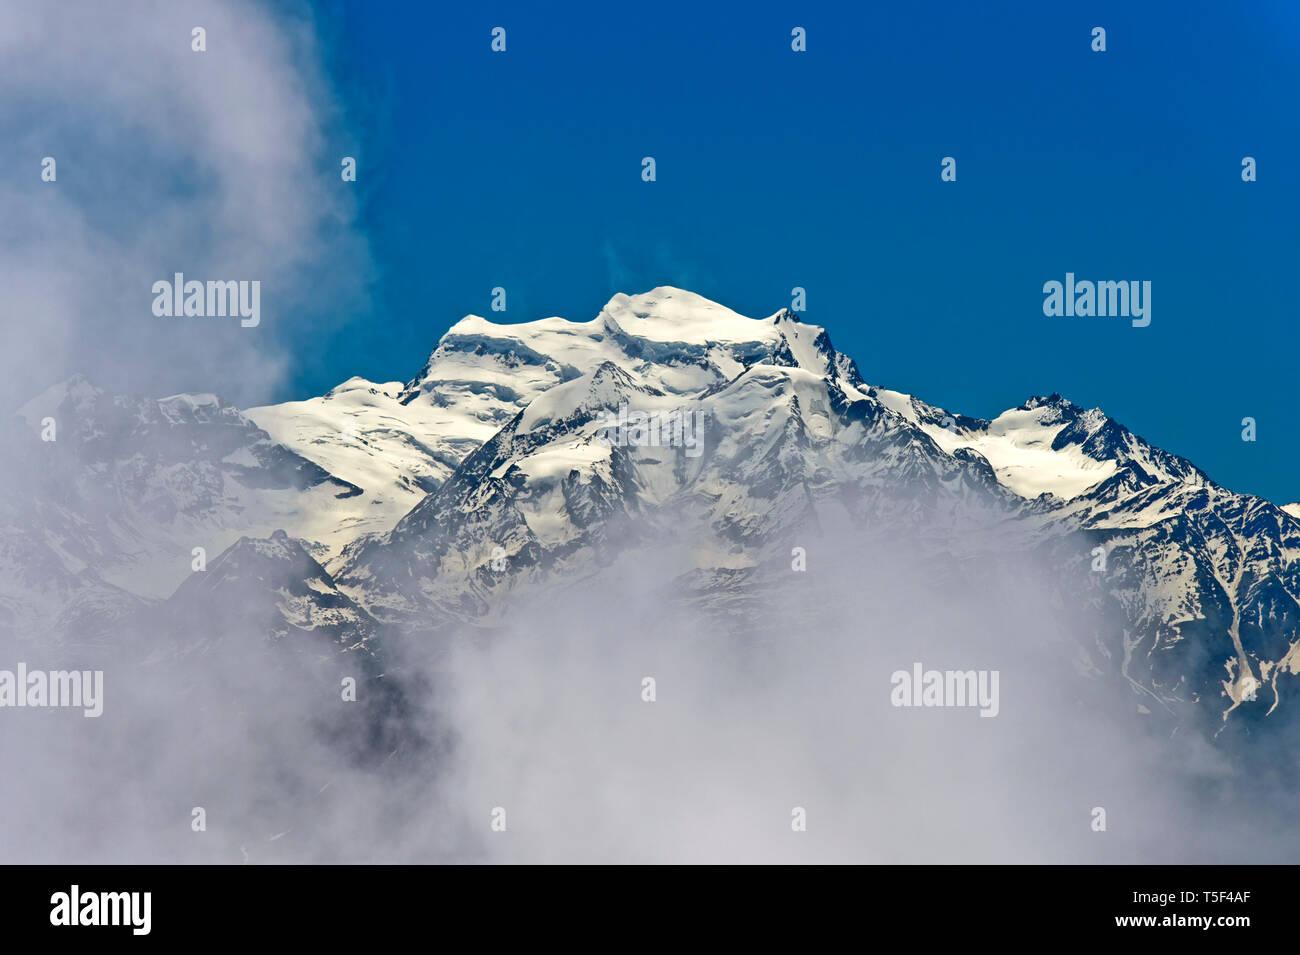 Cloud veil the Grand Combin massif, Pennine Alps, Bourg-Saint-Pierre, Valais, Switzerland - Stock Image